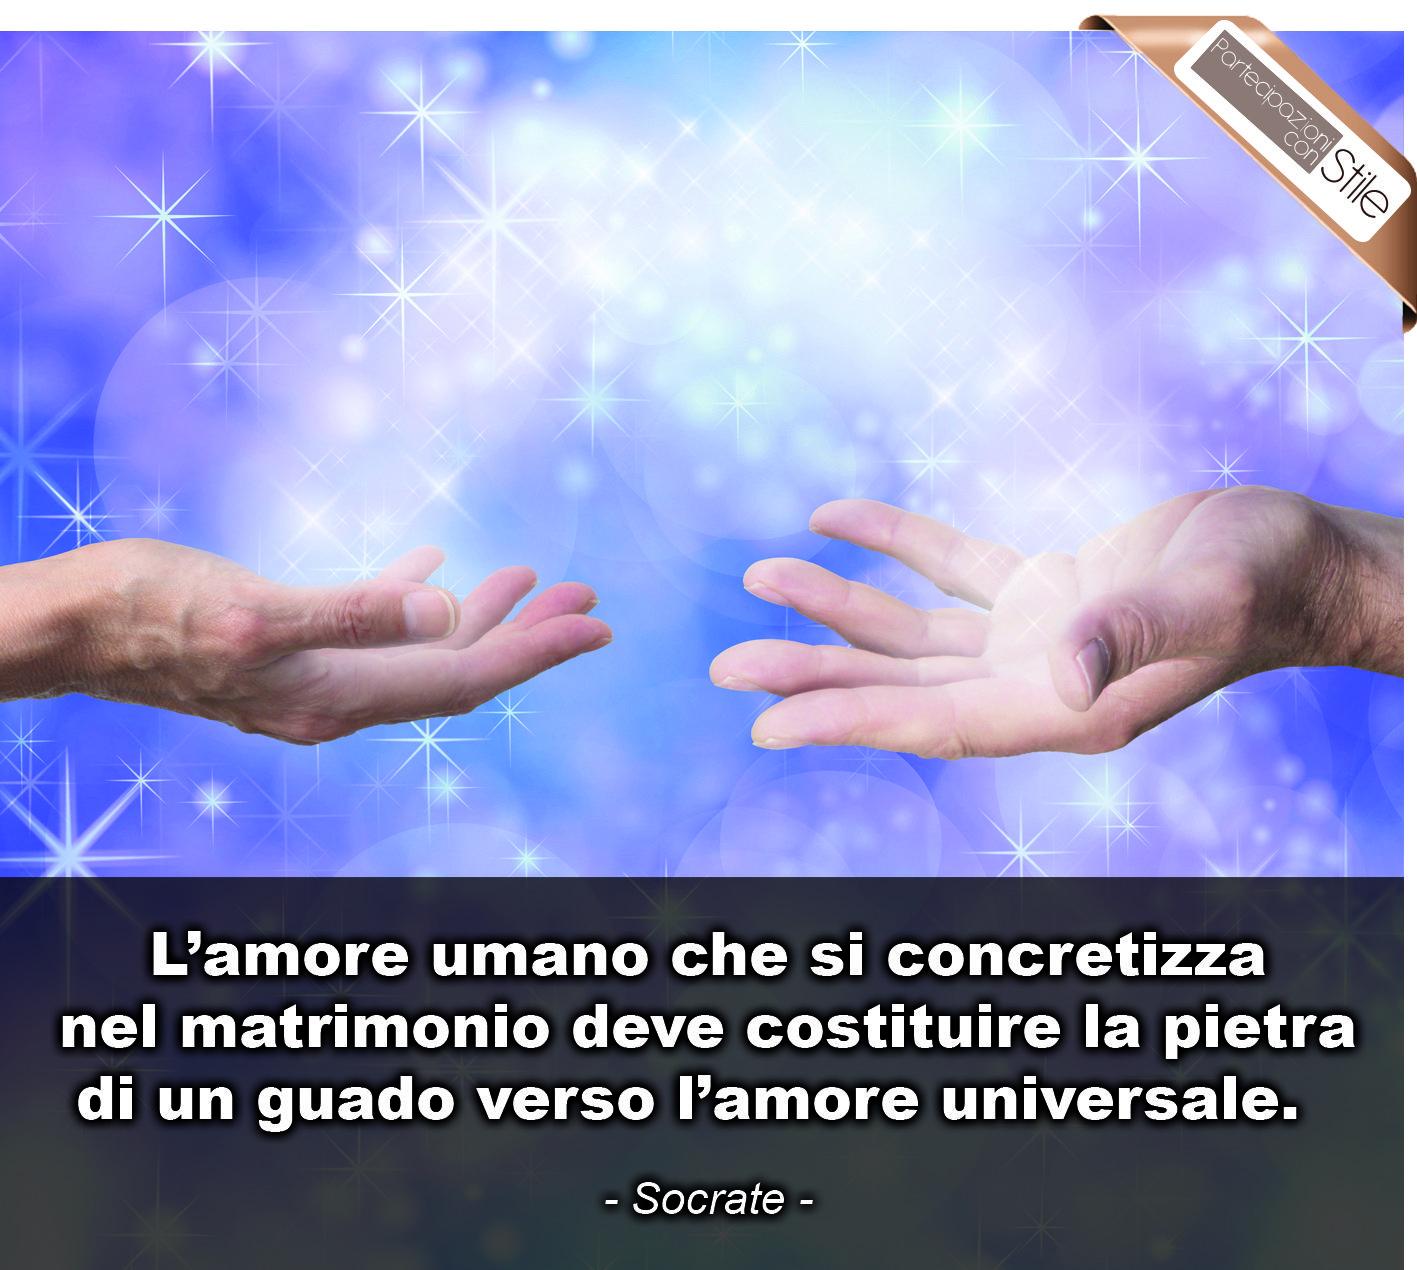 frasi d'amore universale